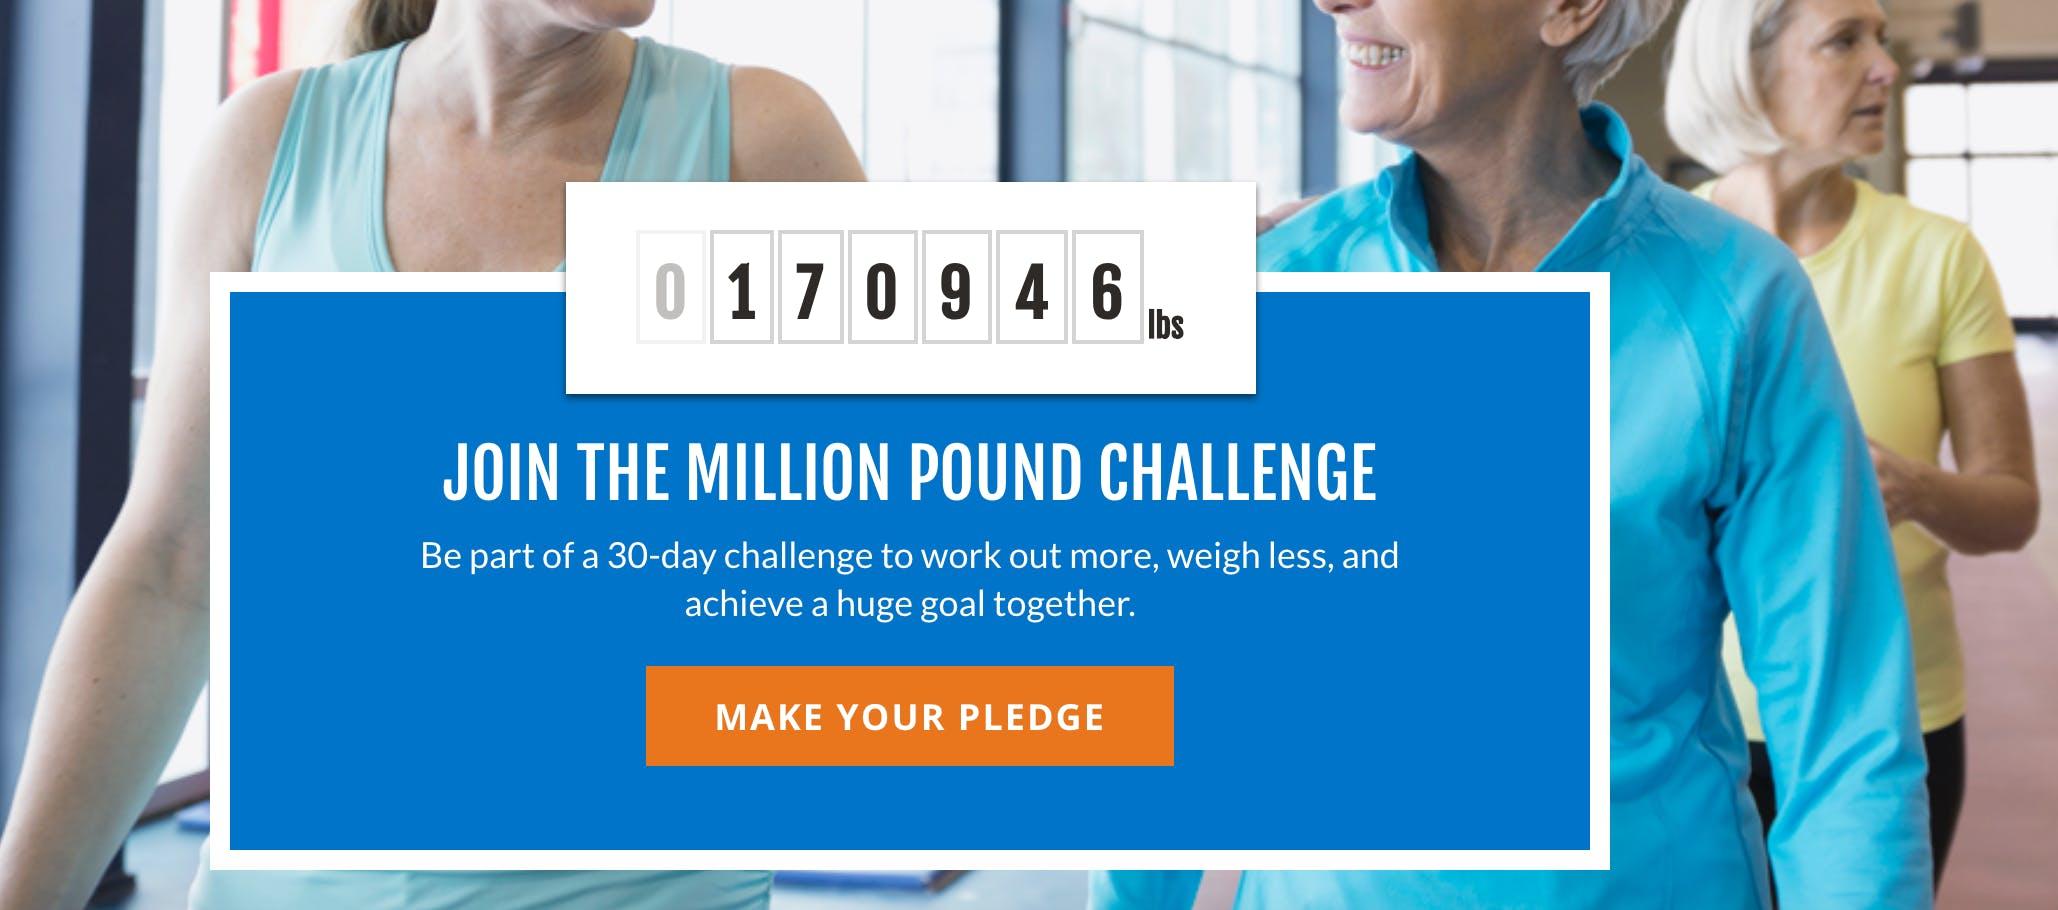 SilverSneakers Million Pound Challenge